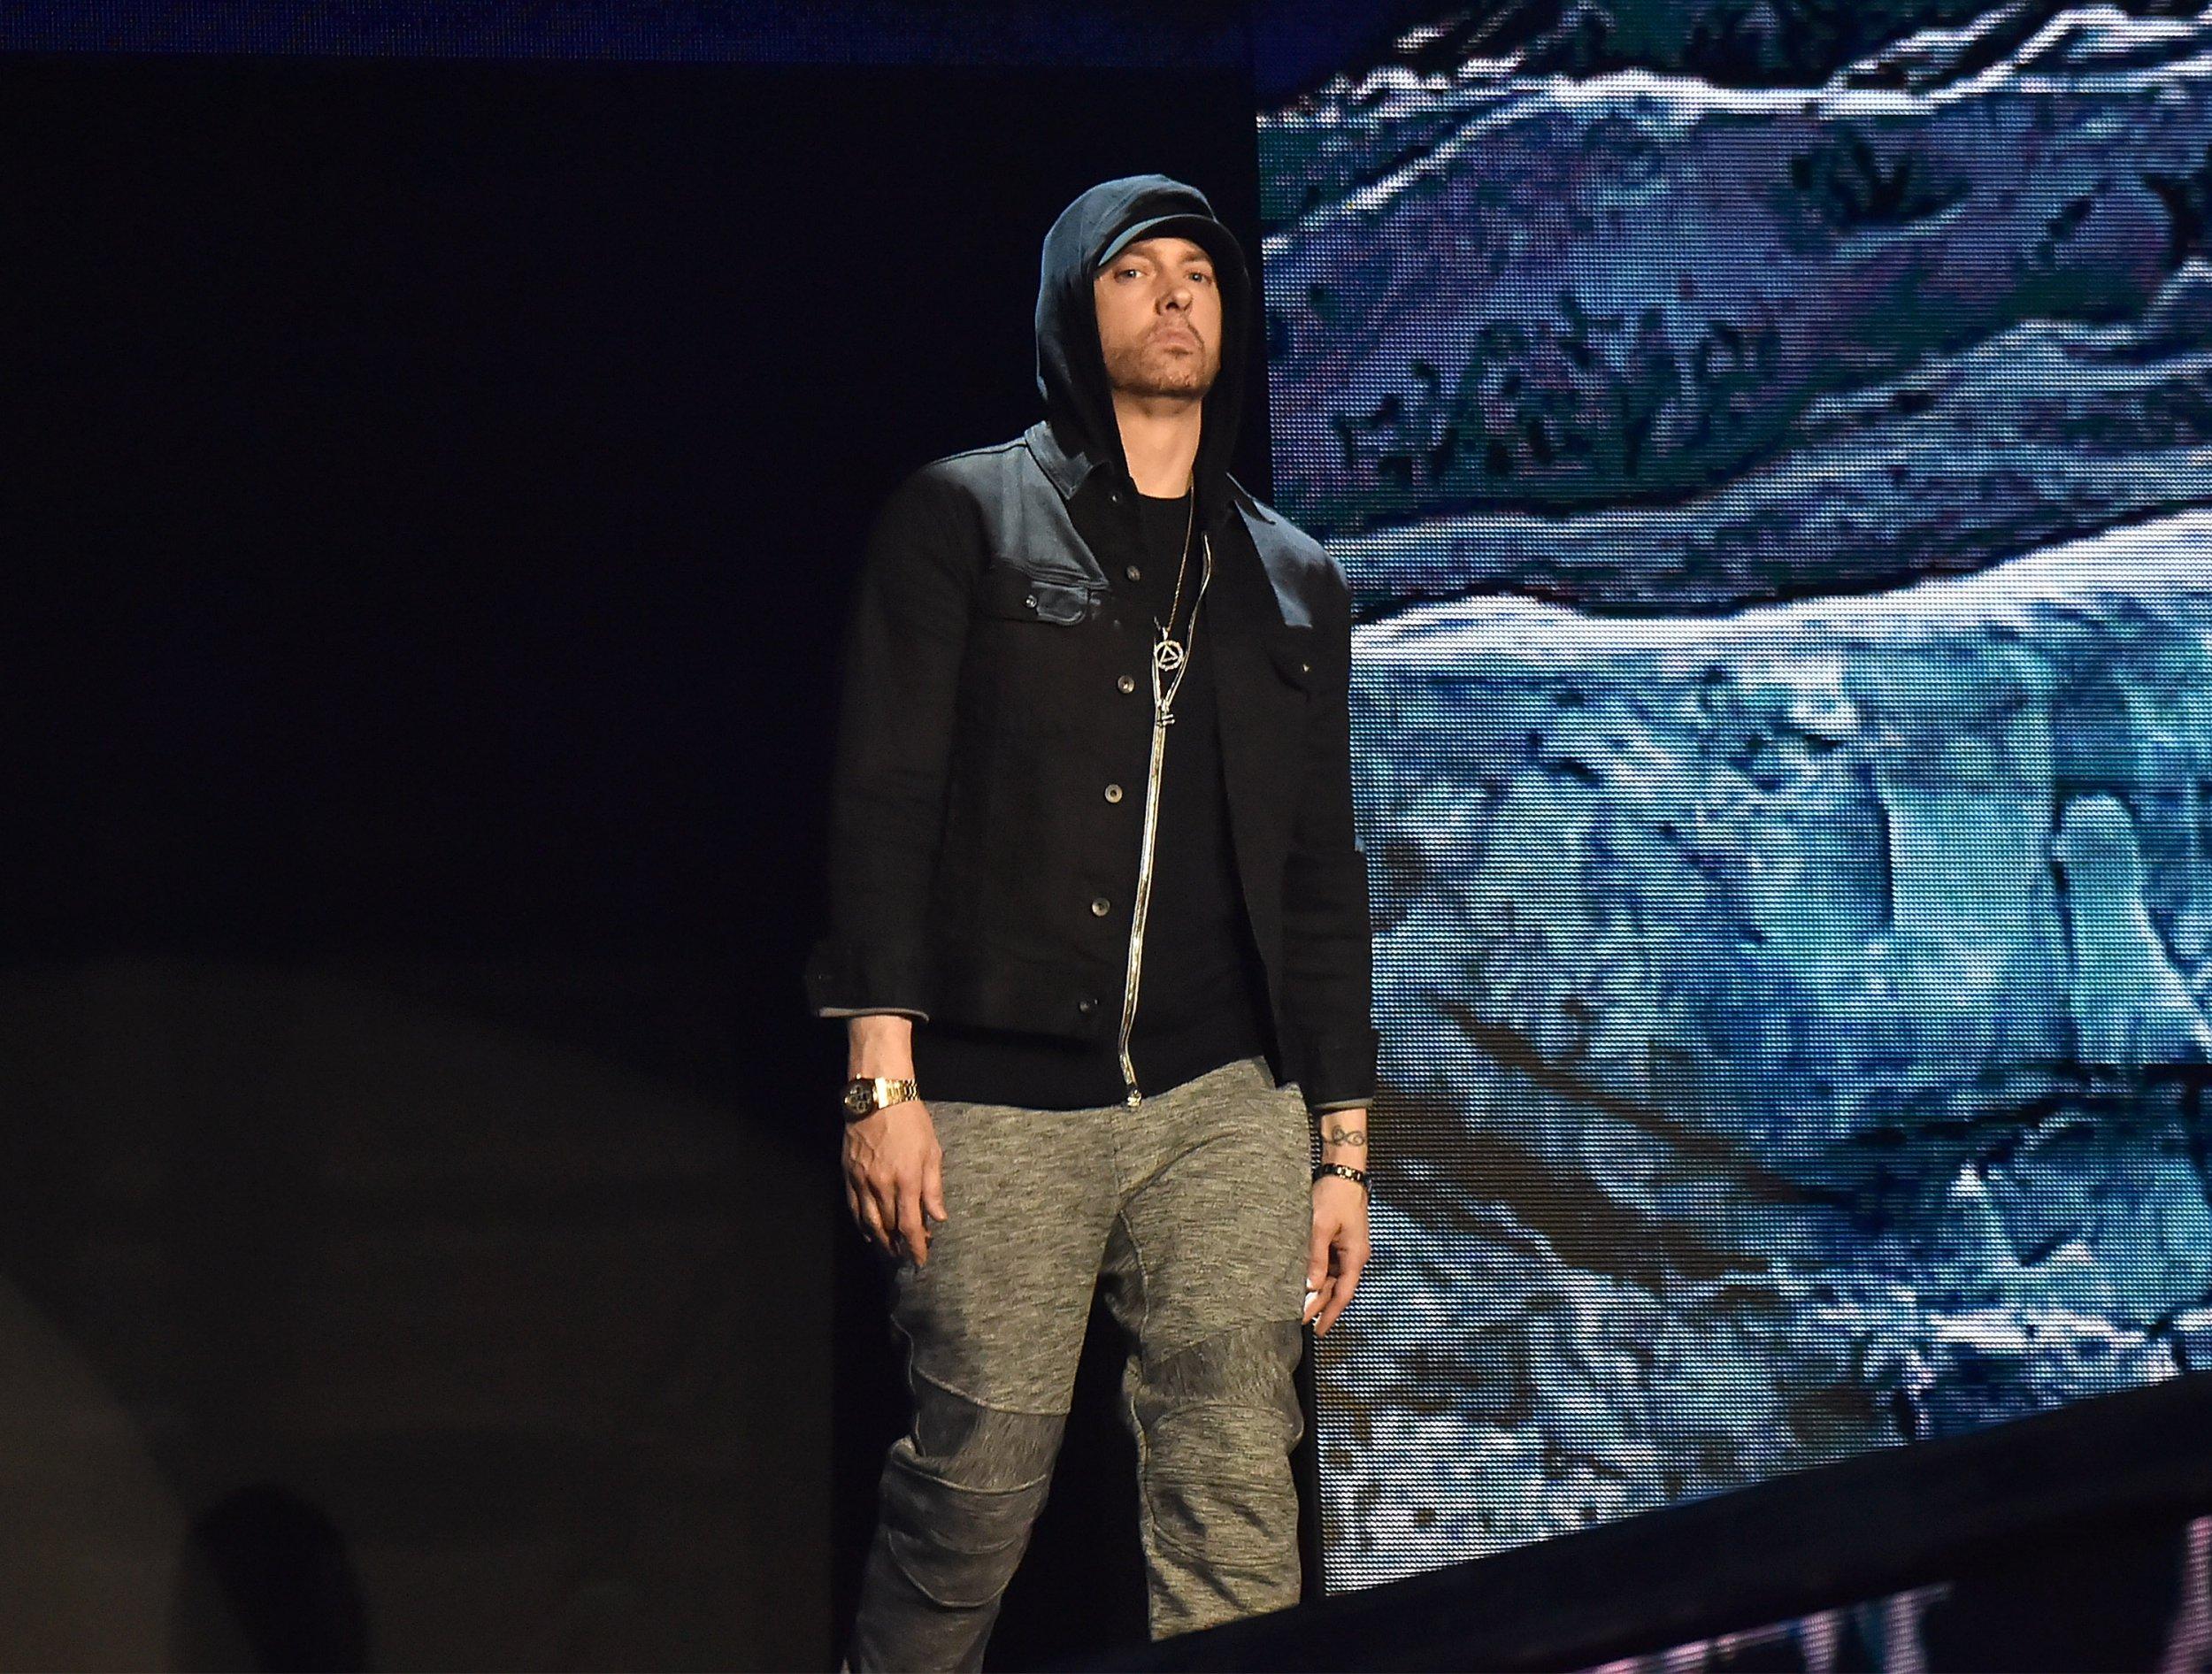 Eminem uses gunshot sounds during Bonnaroo gig leaving fans screaming and 'traumatised'